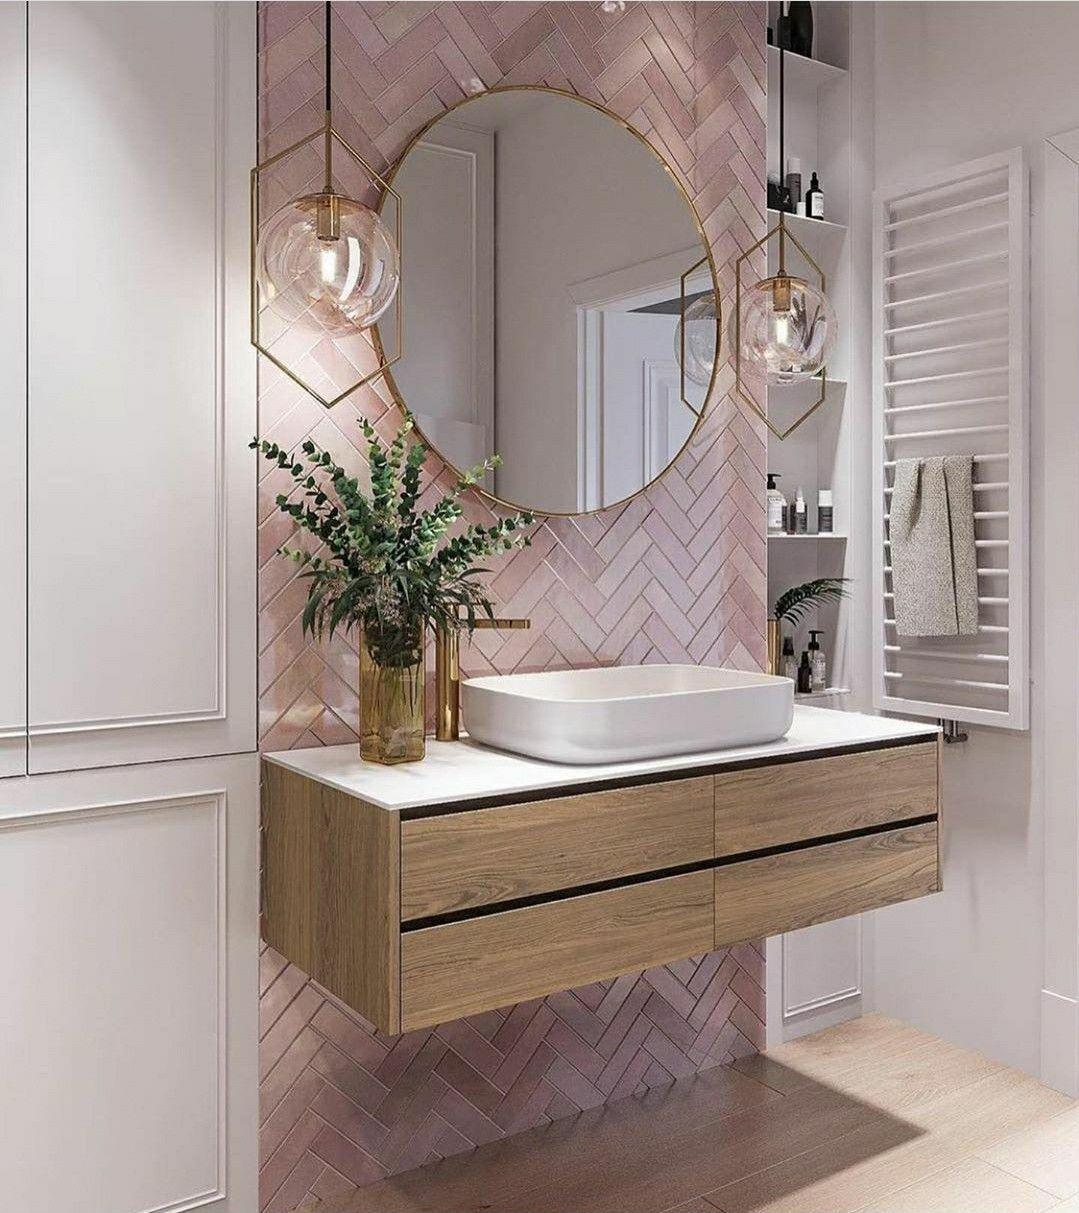 pinmona on bathrooms in 2020  pink bathroom tiles